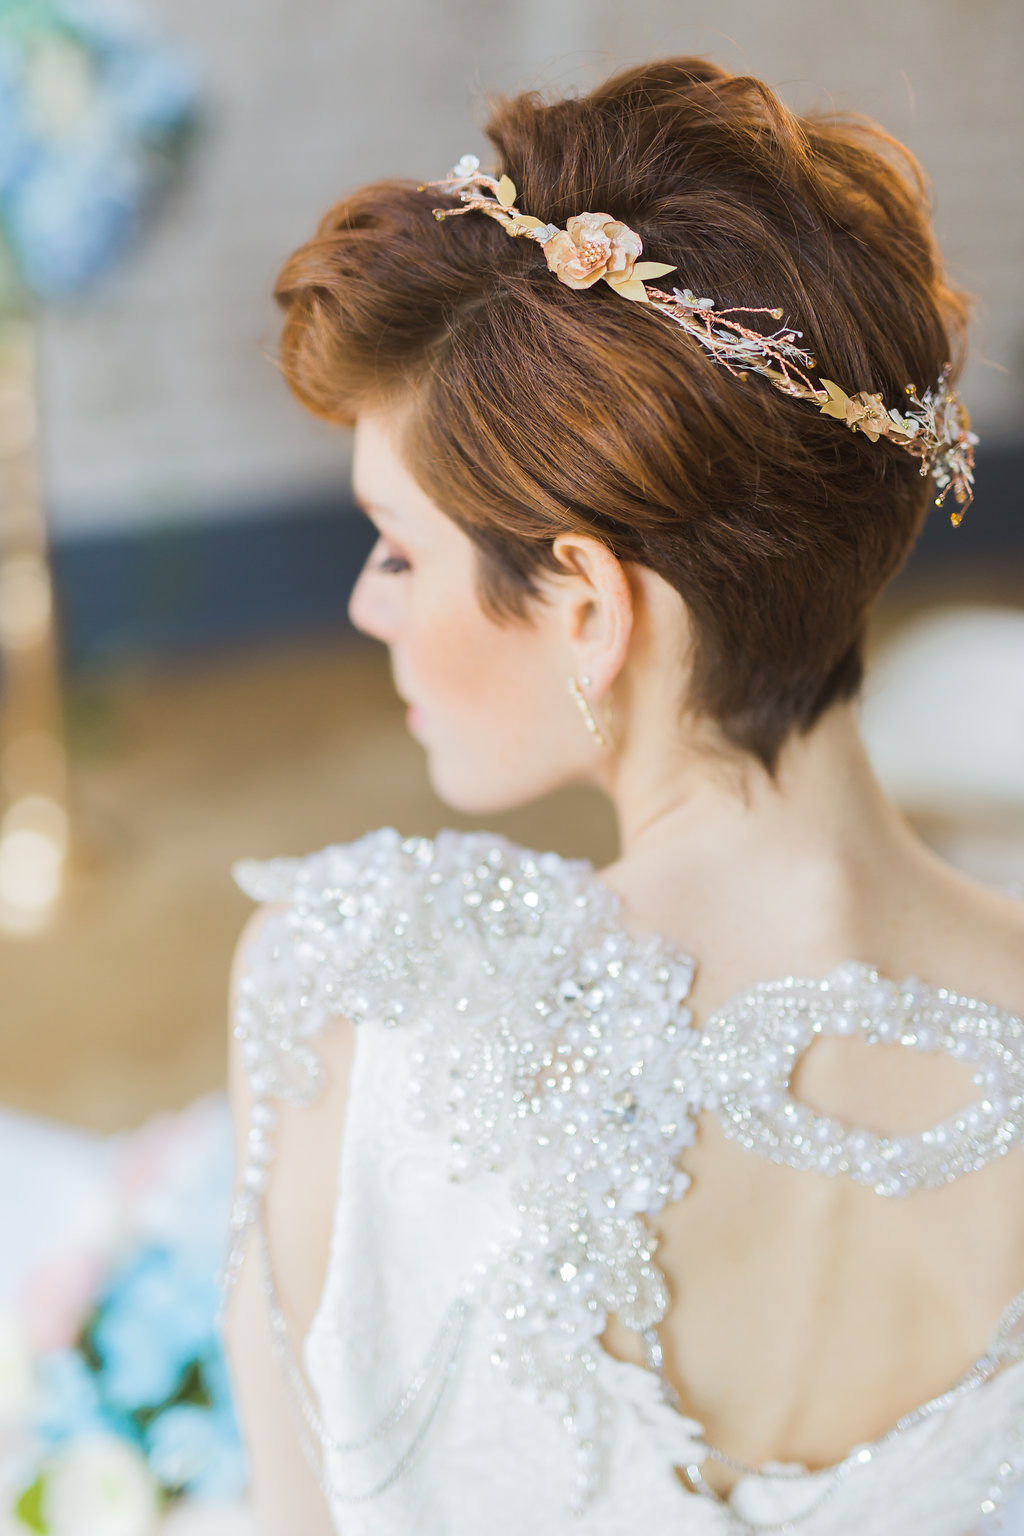 Phoebe Lo Events Toronto Wedding - Storys Building Urban Loft Paper Inspired Wedding 012.jpg